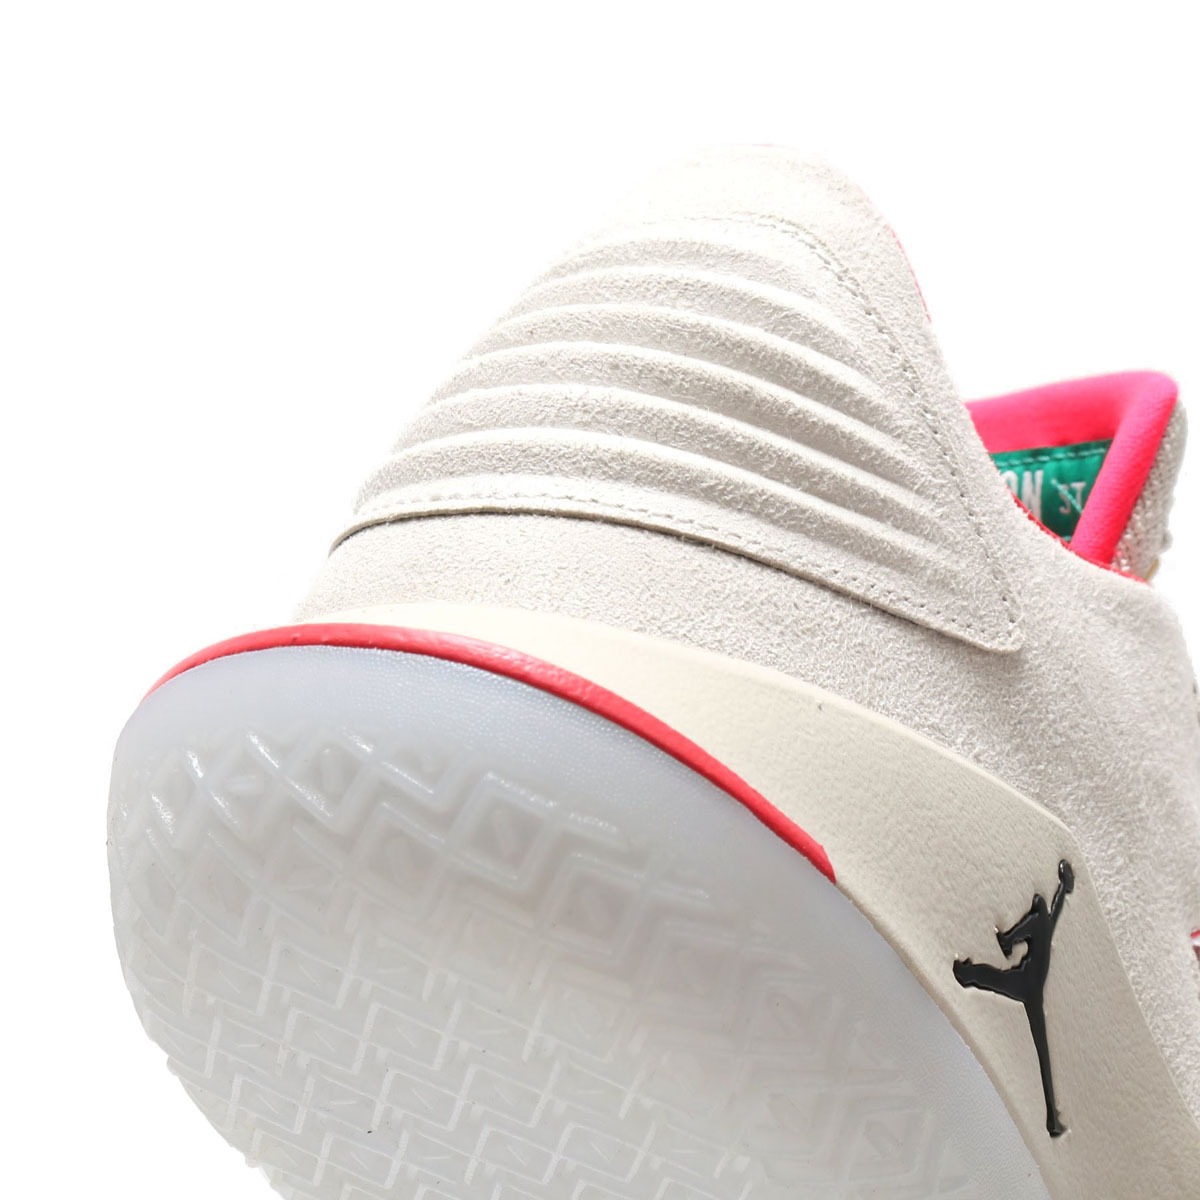 uk availability 23e75 e5d72 NIKE AIR JORDAN XXXII LOW PF (Nike Air Jordan XXXII low PF) LIGHT BONE BLACK-VACHETTA  TAN-INFRARED 18SU-S